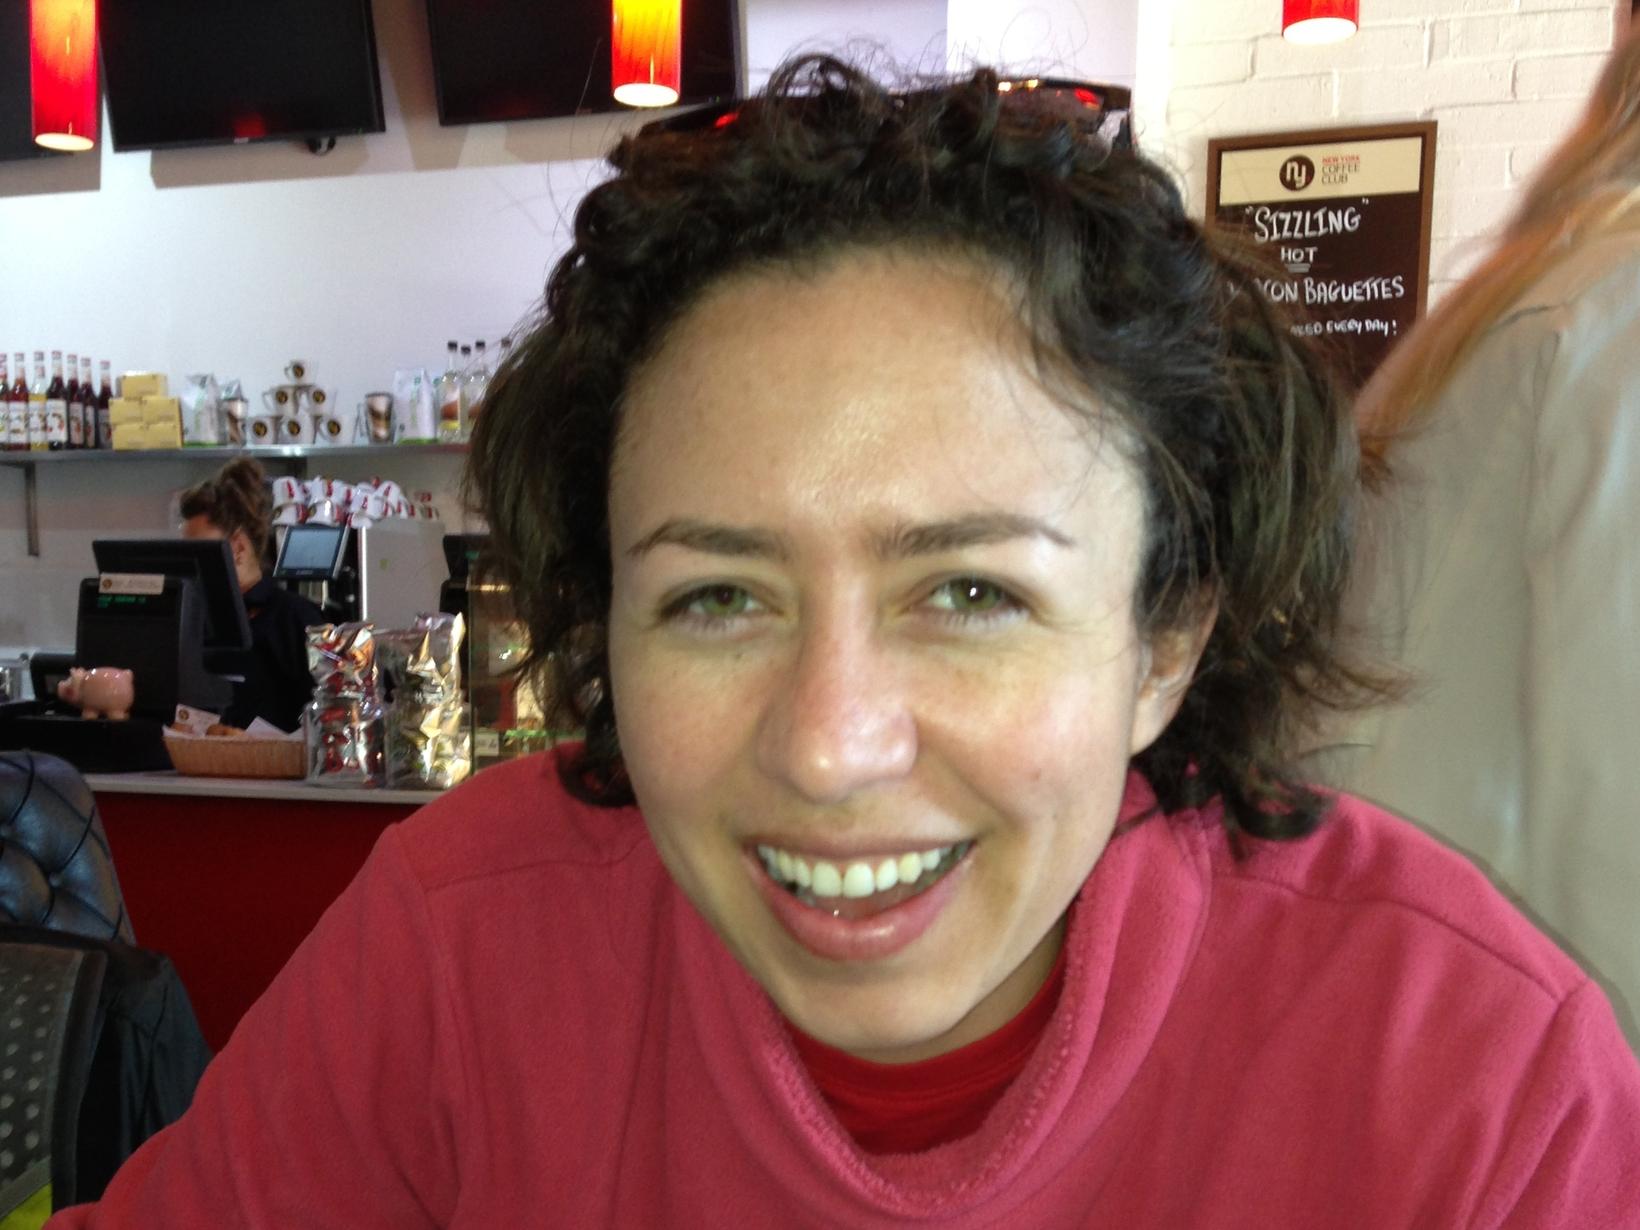 Kelly from London, United Kingdom